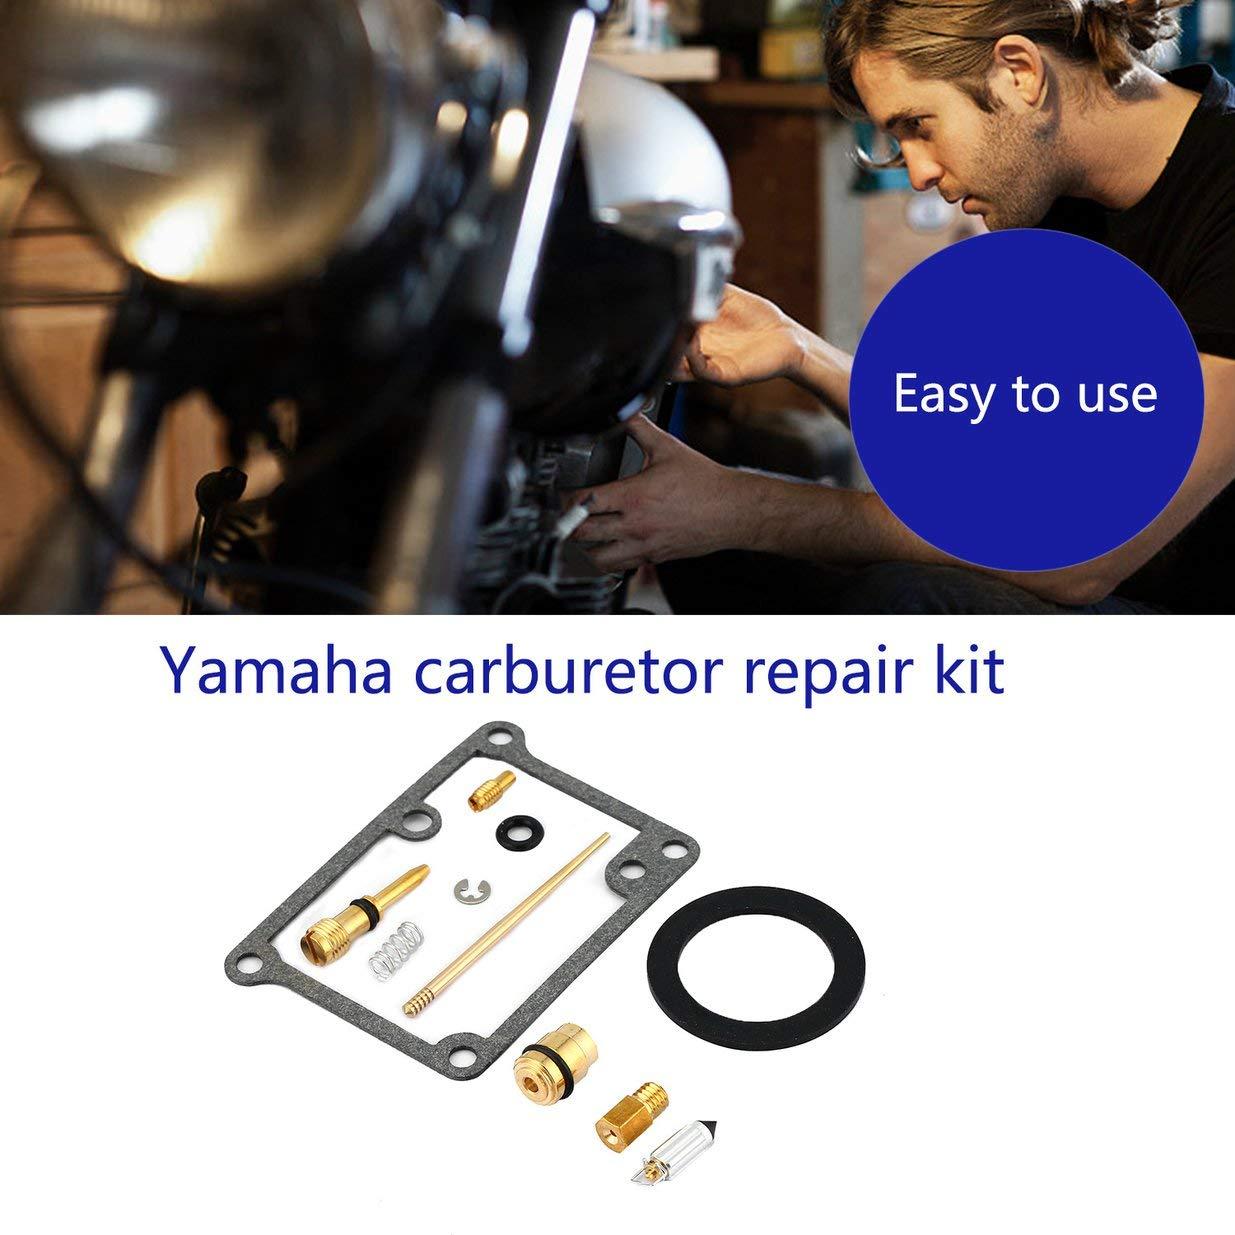 Negro Banbie8409 Nuevo Kit de Pieza de reparaci/ón de carburador//reconstrucci/ón de carburador para Yamaha Blaster 200 YFS200